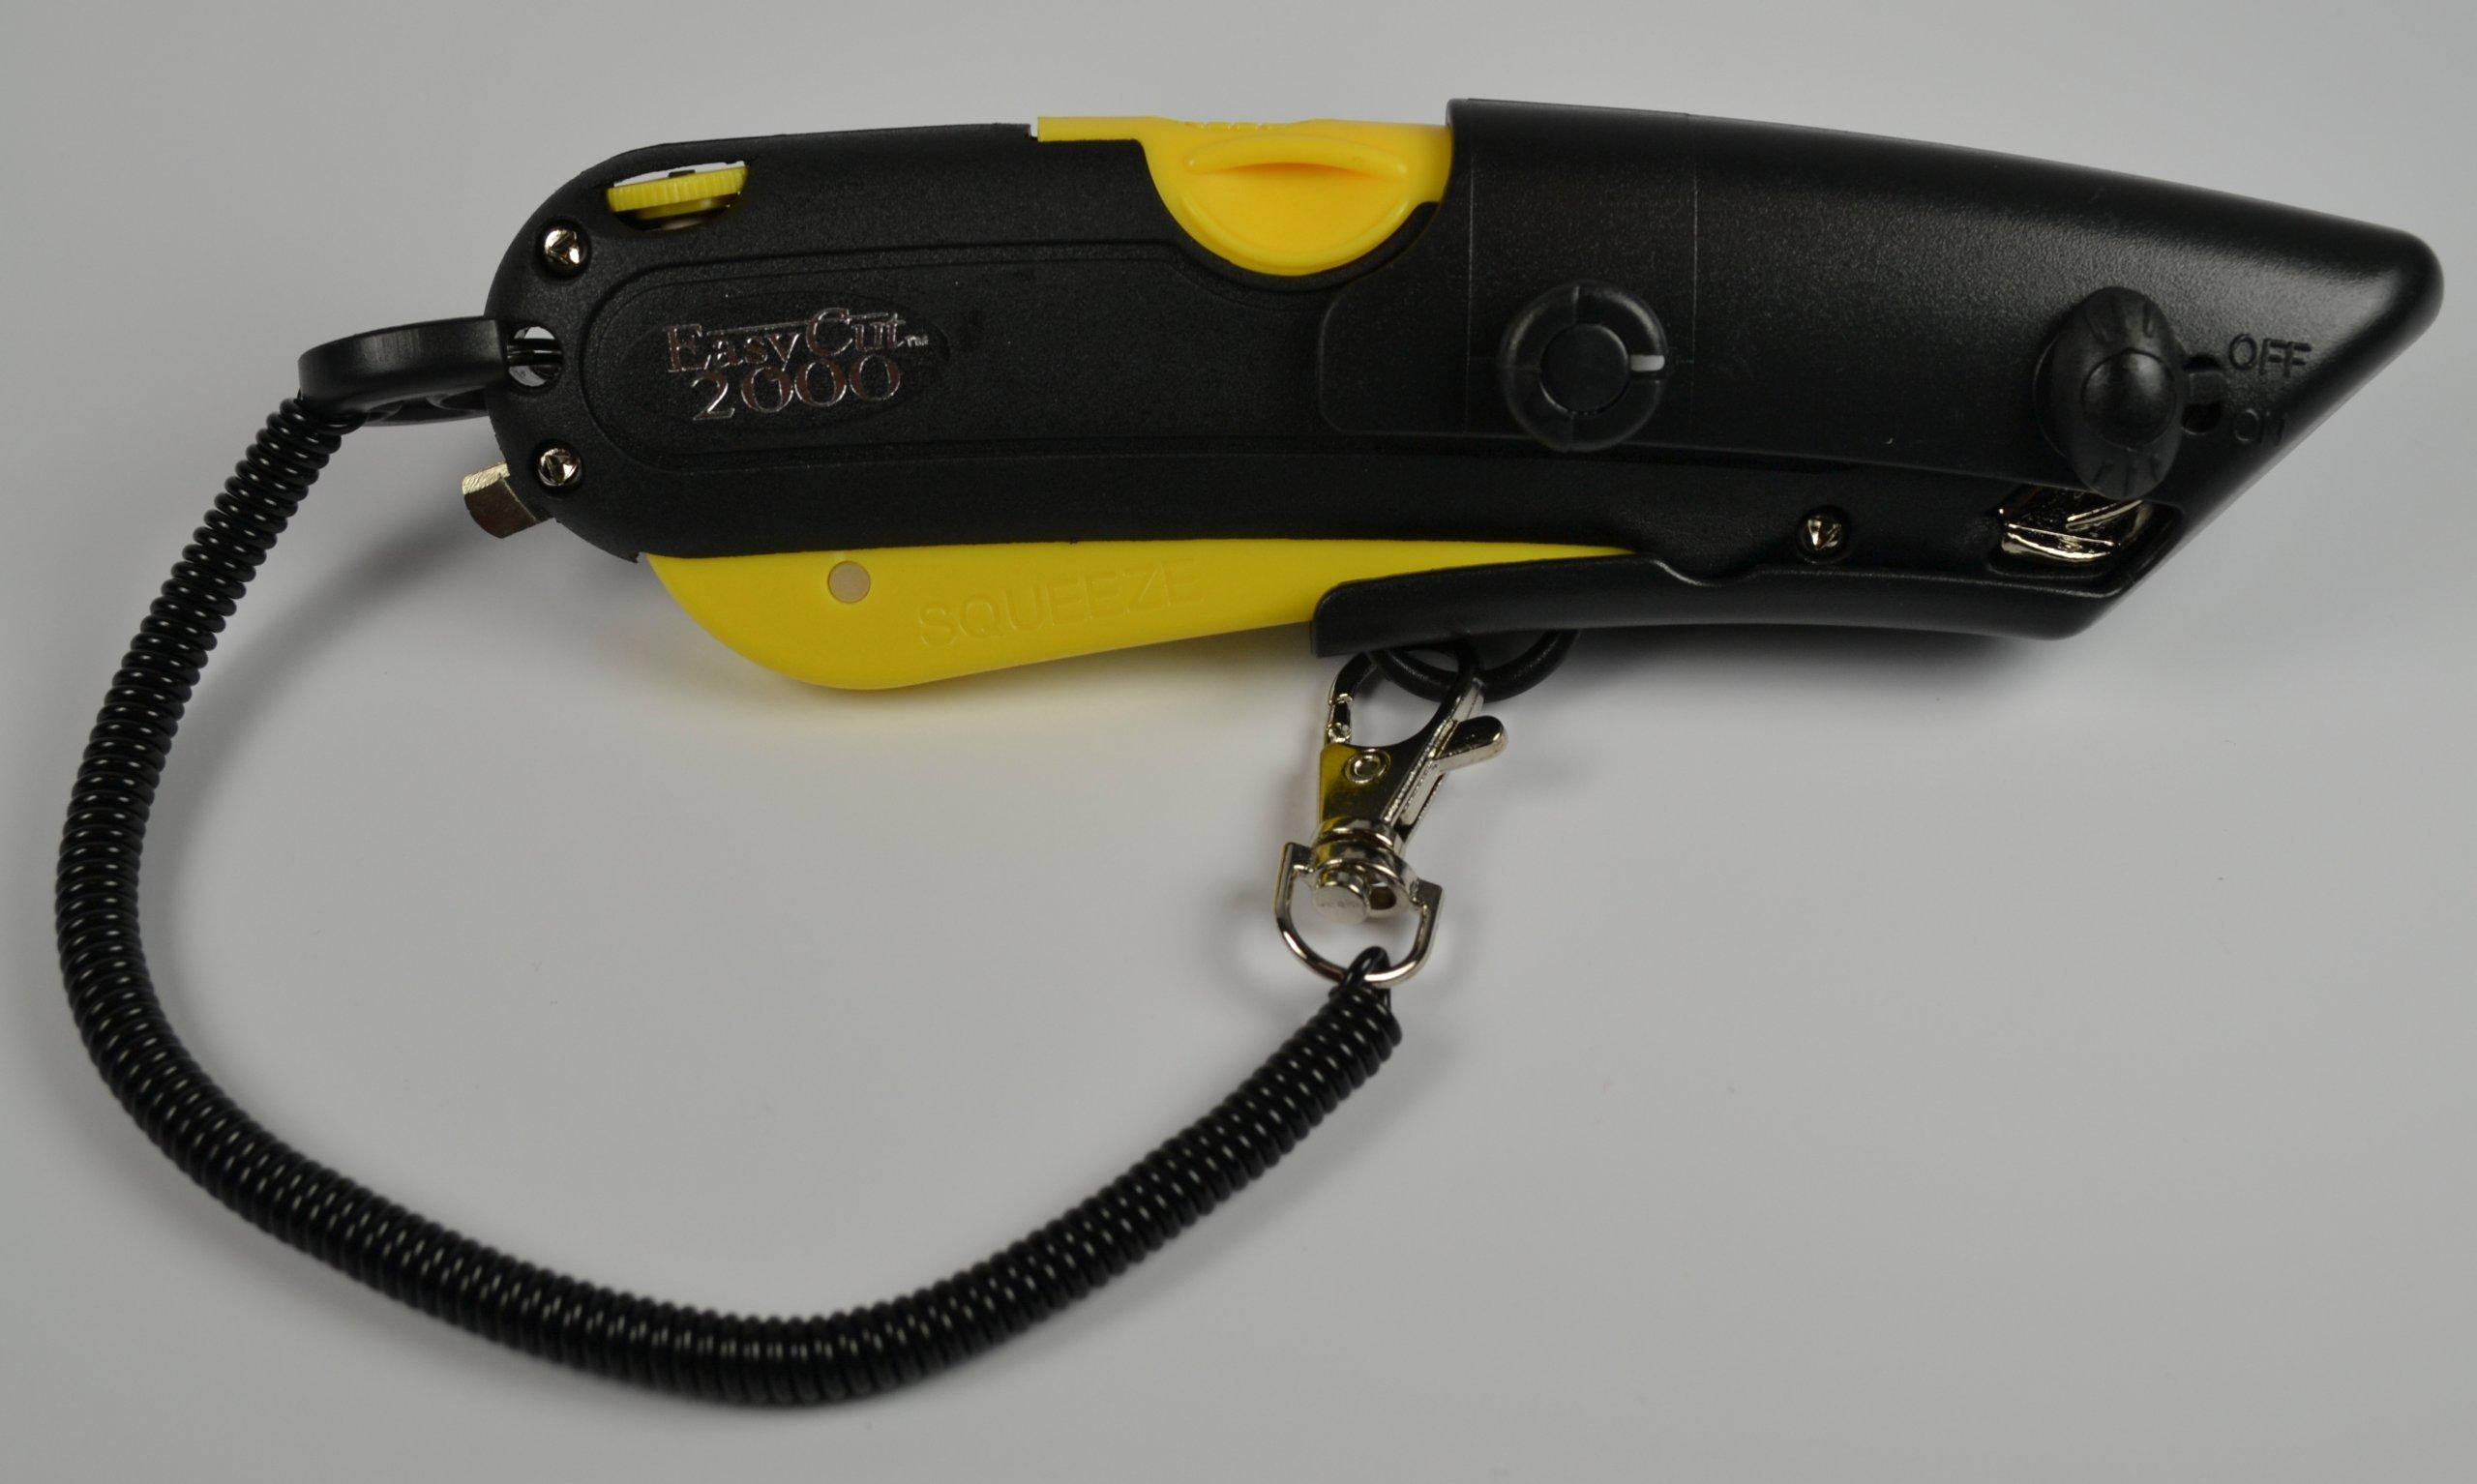 25 Pcs EZ Cut Easycut Safety Carton Box Cutter, Yellow